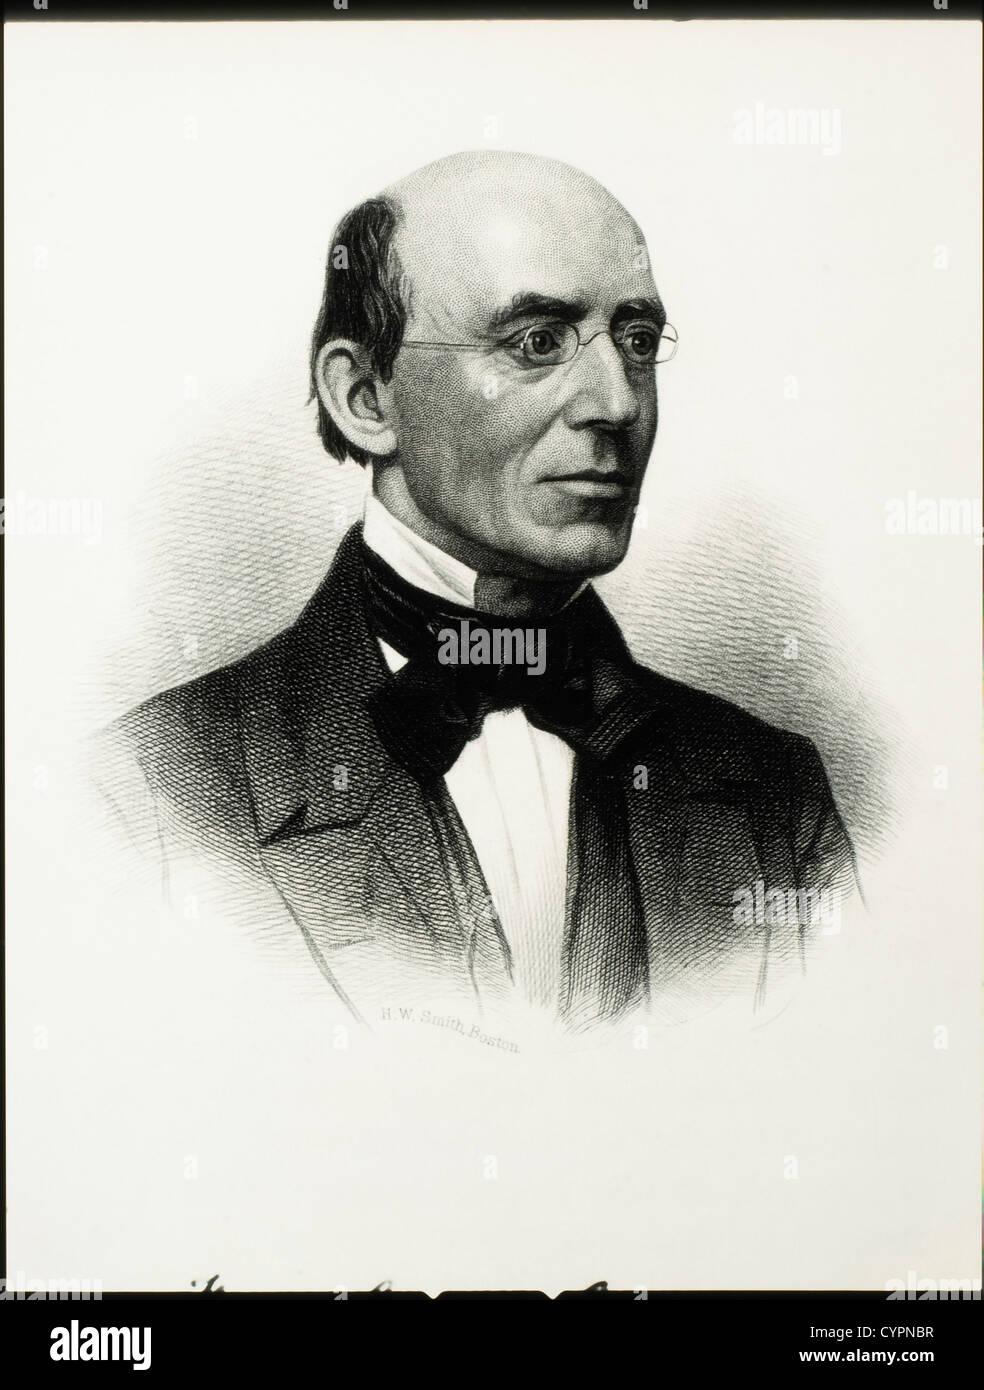 William Lloyd Garrison (1805-1879), Abolitionist and Publisher - Stock Image